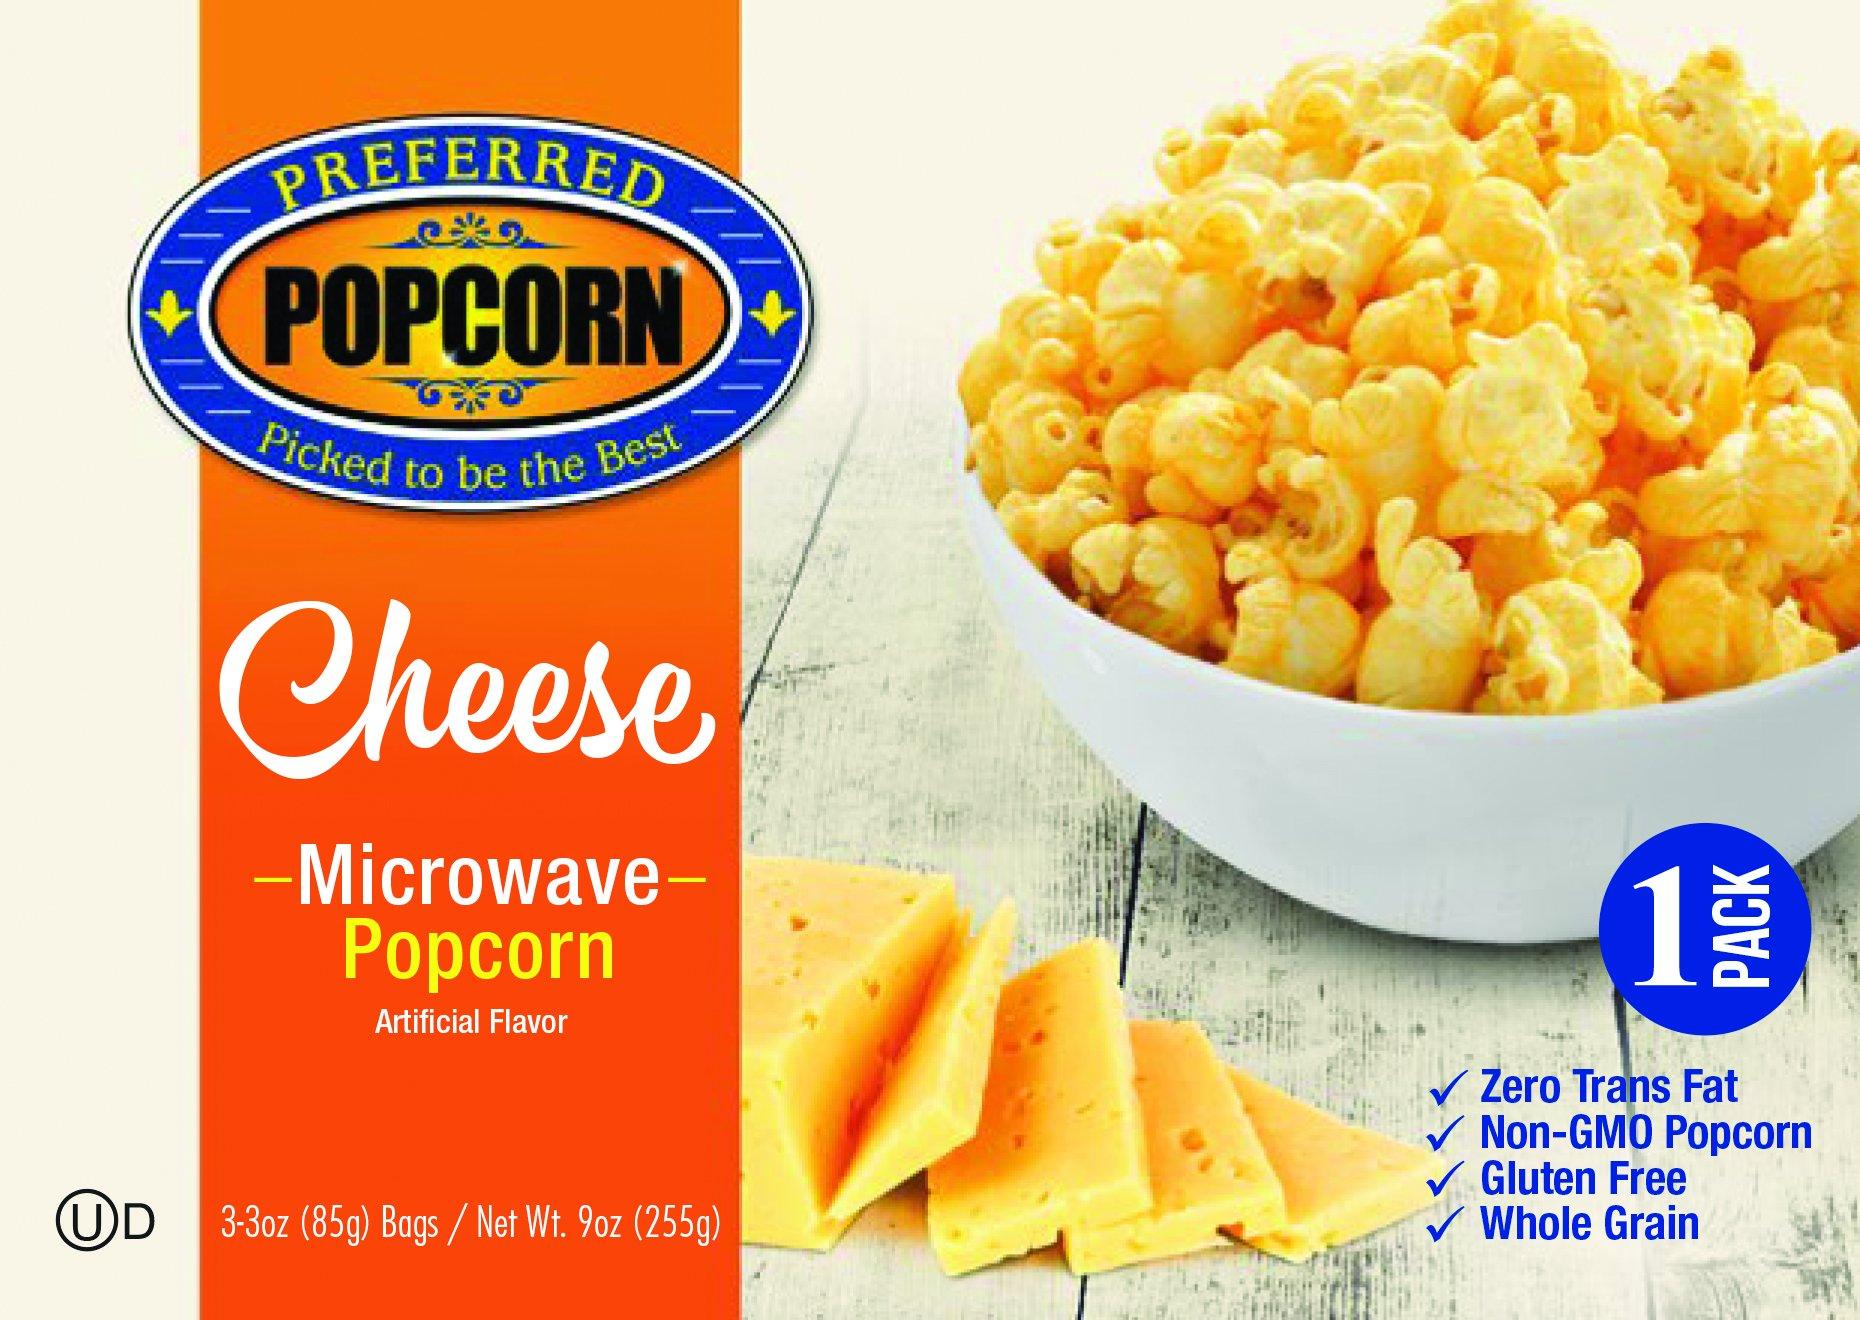 Microwave Cheese Popcorn - Preferred Popcorn - 100% Farmer Owned - Non GMO - Gluten Free - Whole Grain - One 3.0 oz Bag - Made in USA - Made in Nebraska - Real Cheese Flavor - Cheesy Snack